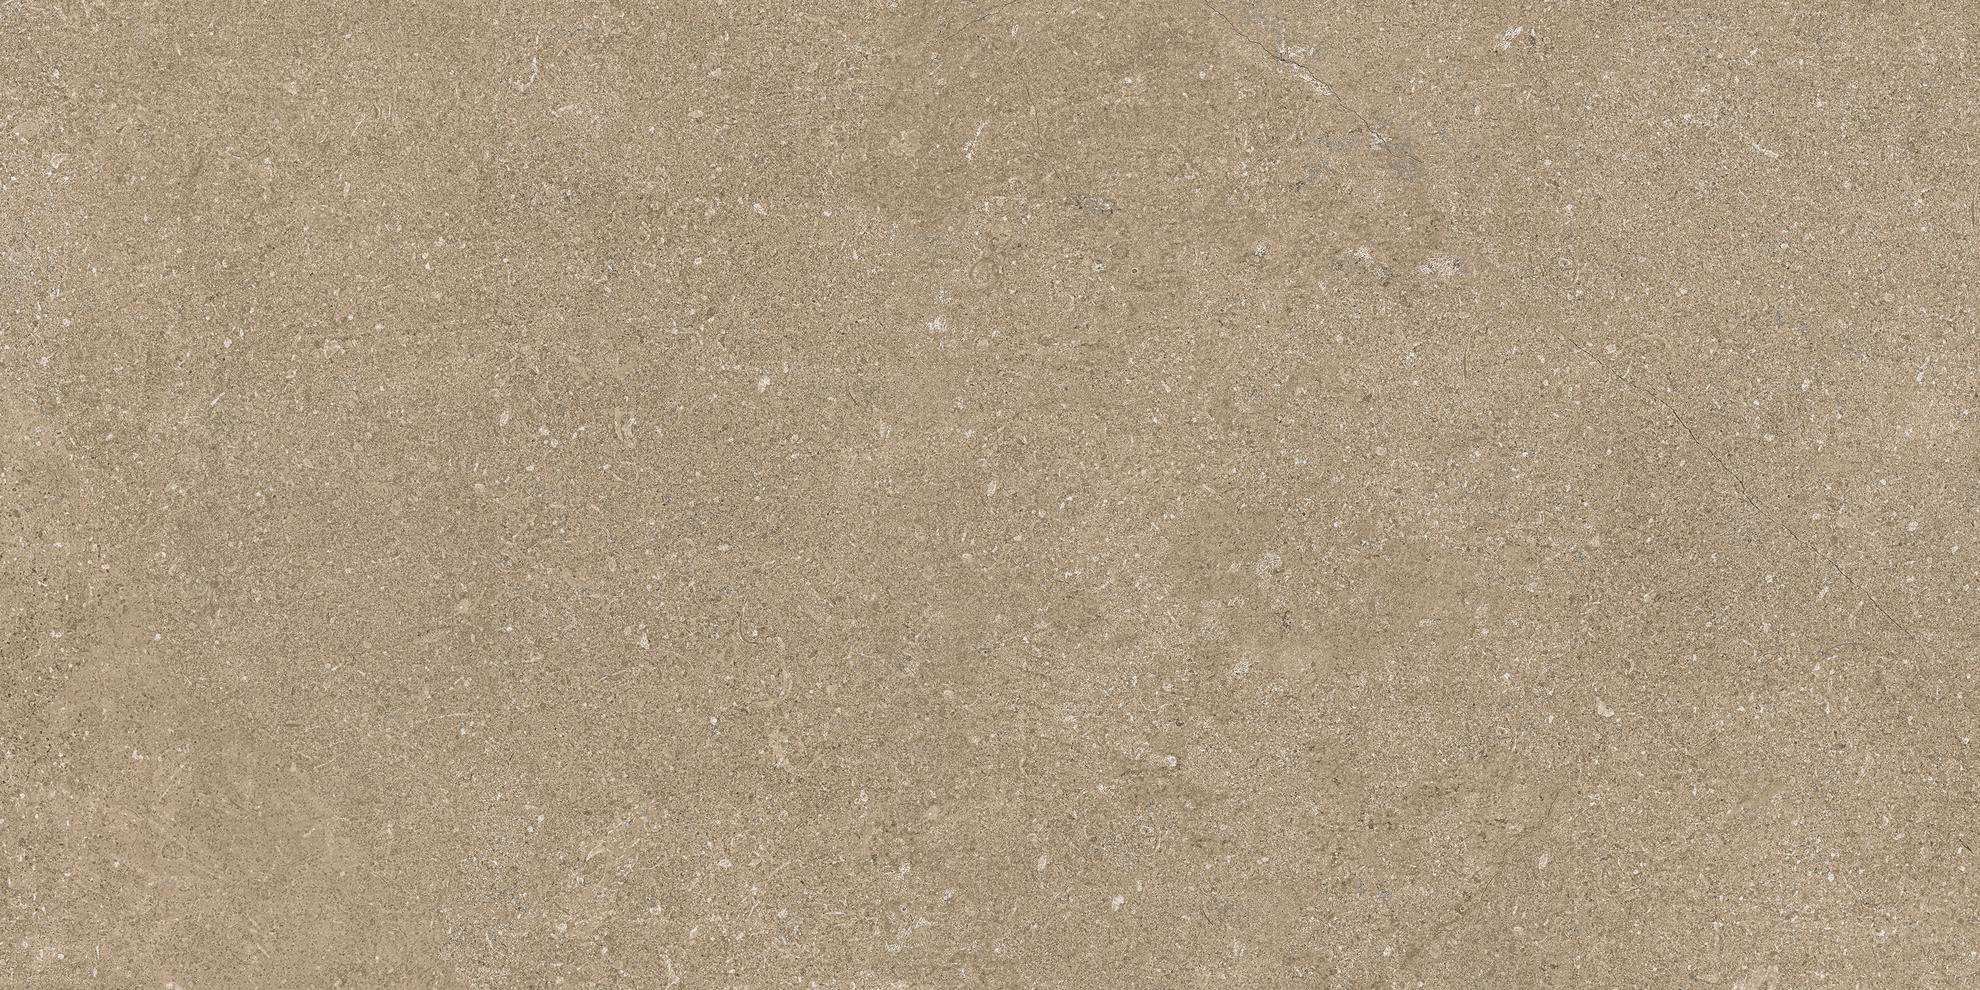 30x60 Newcon Tile Taupe Matt